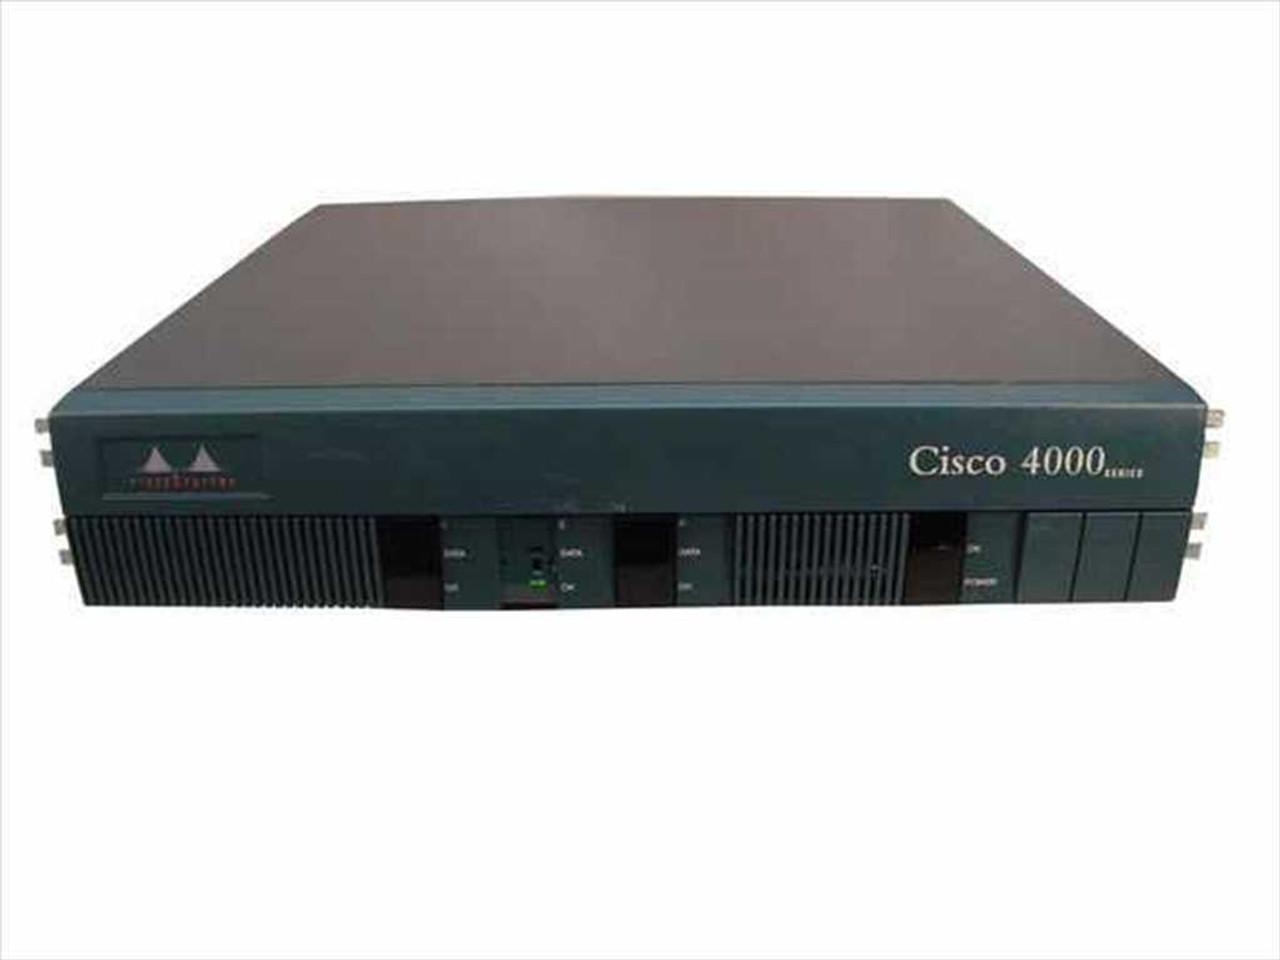 cisco offices studio oa ac. Cisco C4500 4000 Series Router Chassis W/2 Modules \u0026 AC Offices Studio Oa Ac